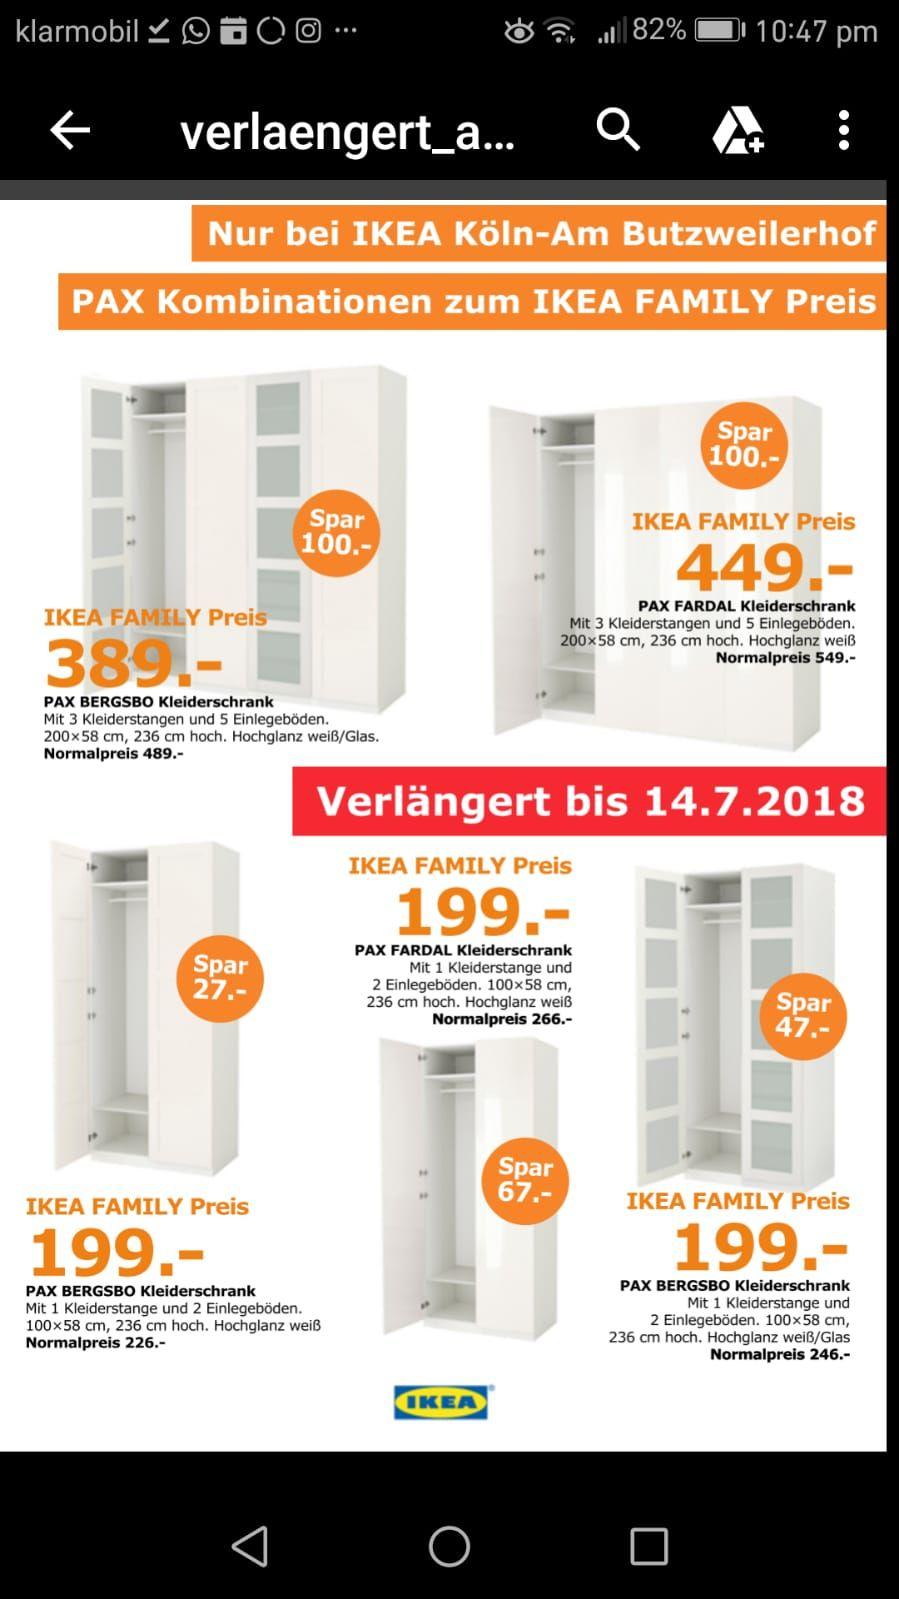 [Lokal Köln Butzweilerhof] IKEA PAX Family Angebote